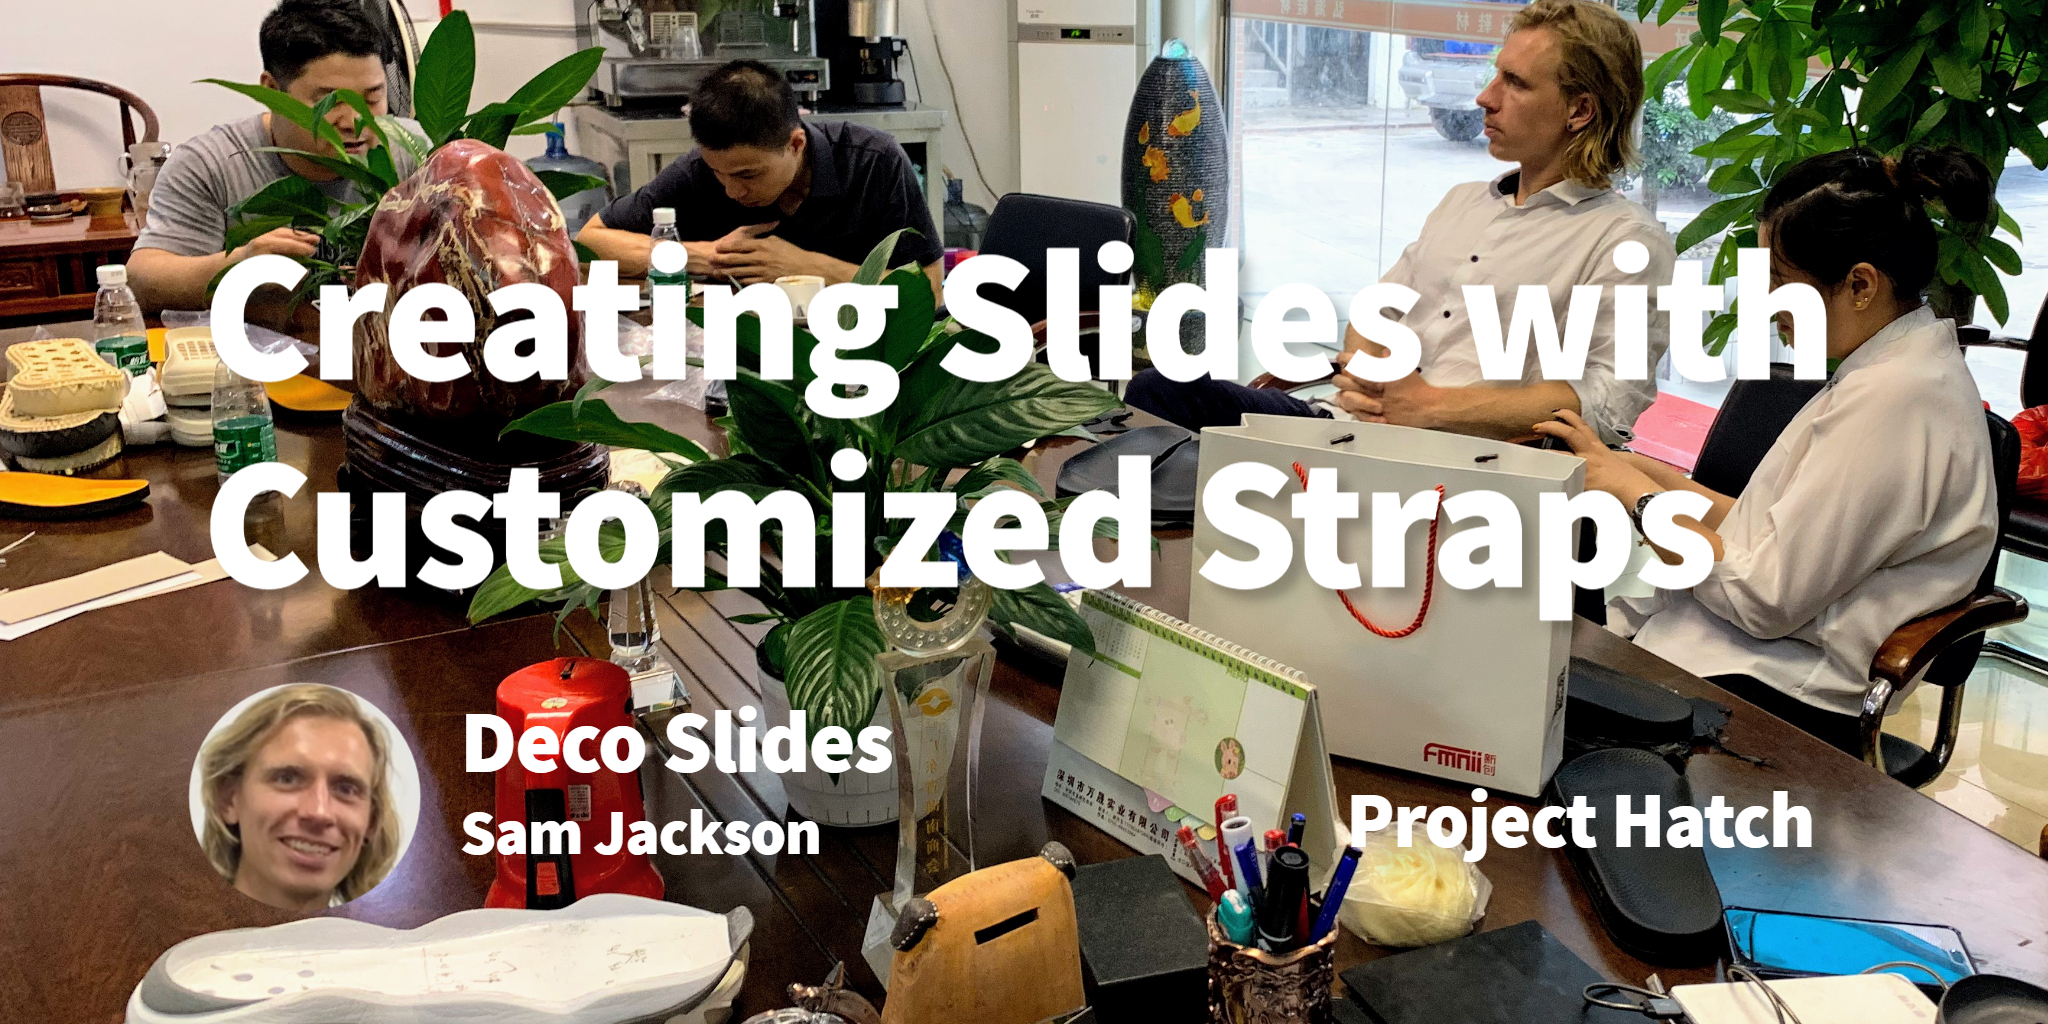 Deco Slides Sam Jackson